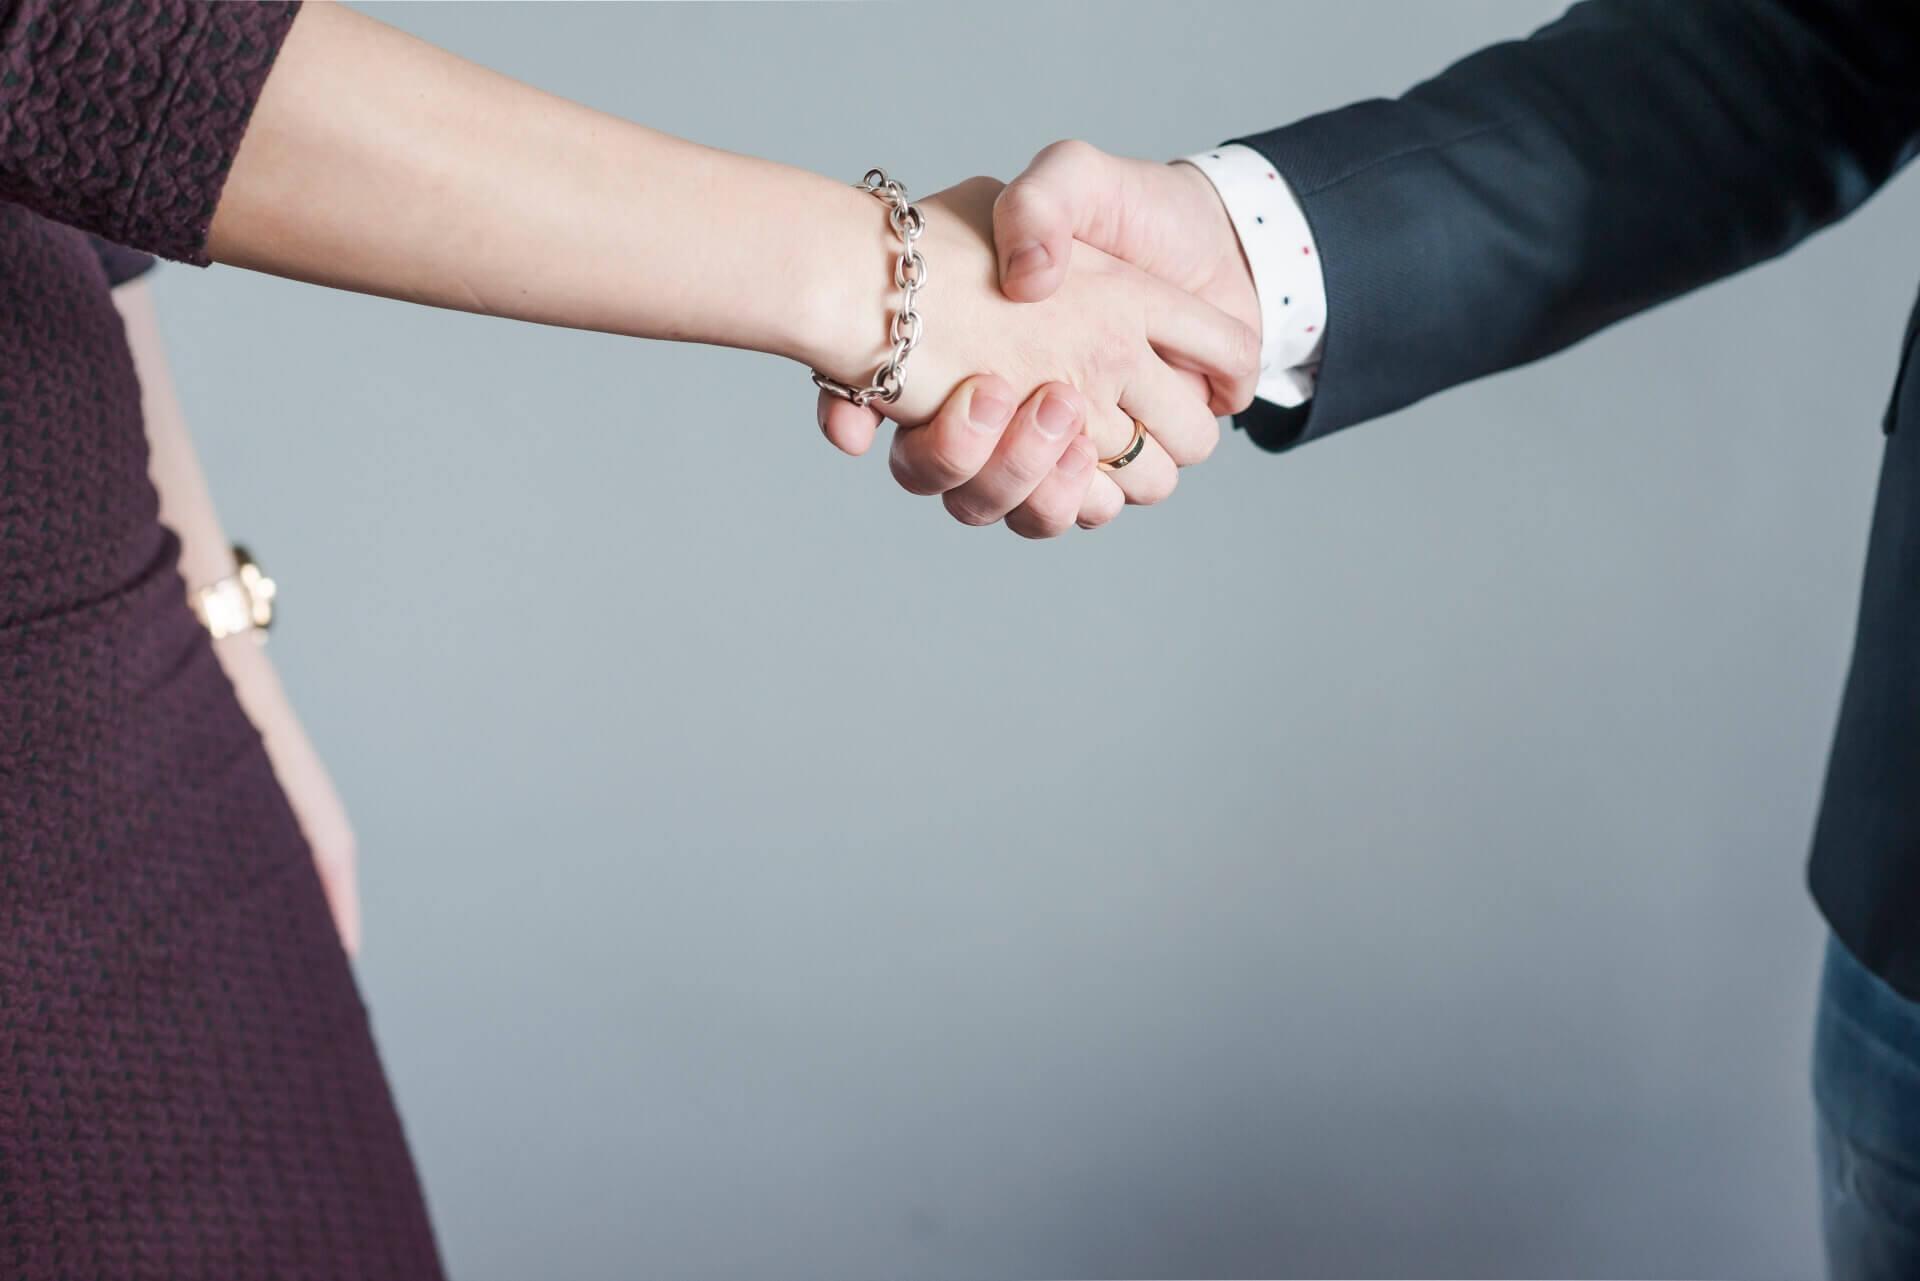 Werken-bij-Lagarde-groep-akkoord